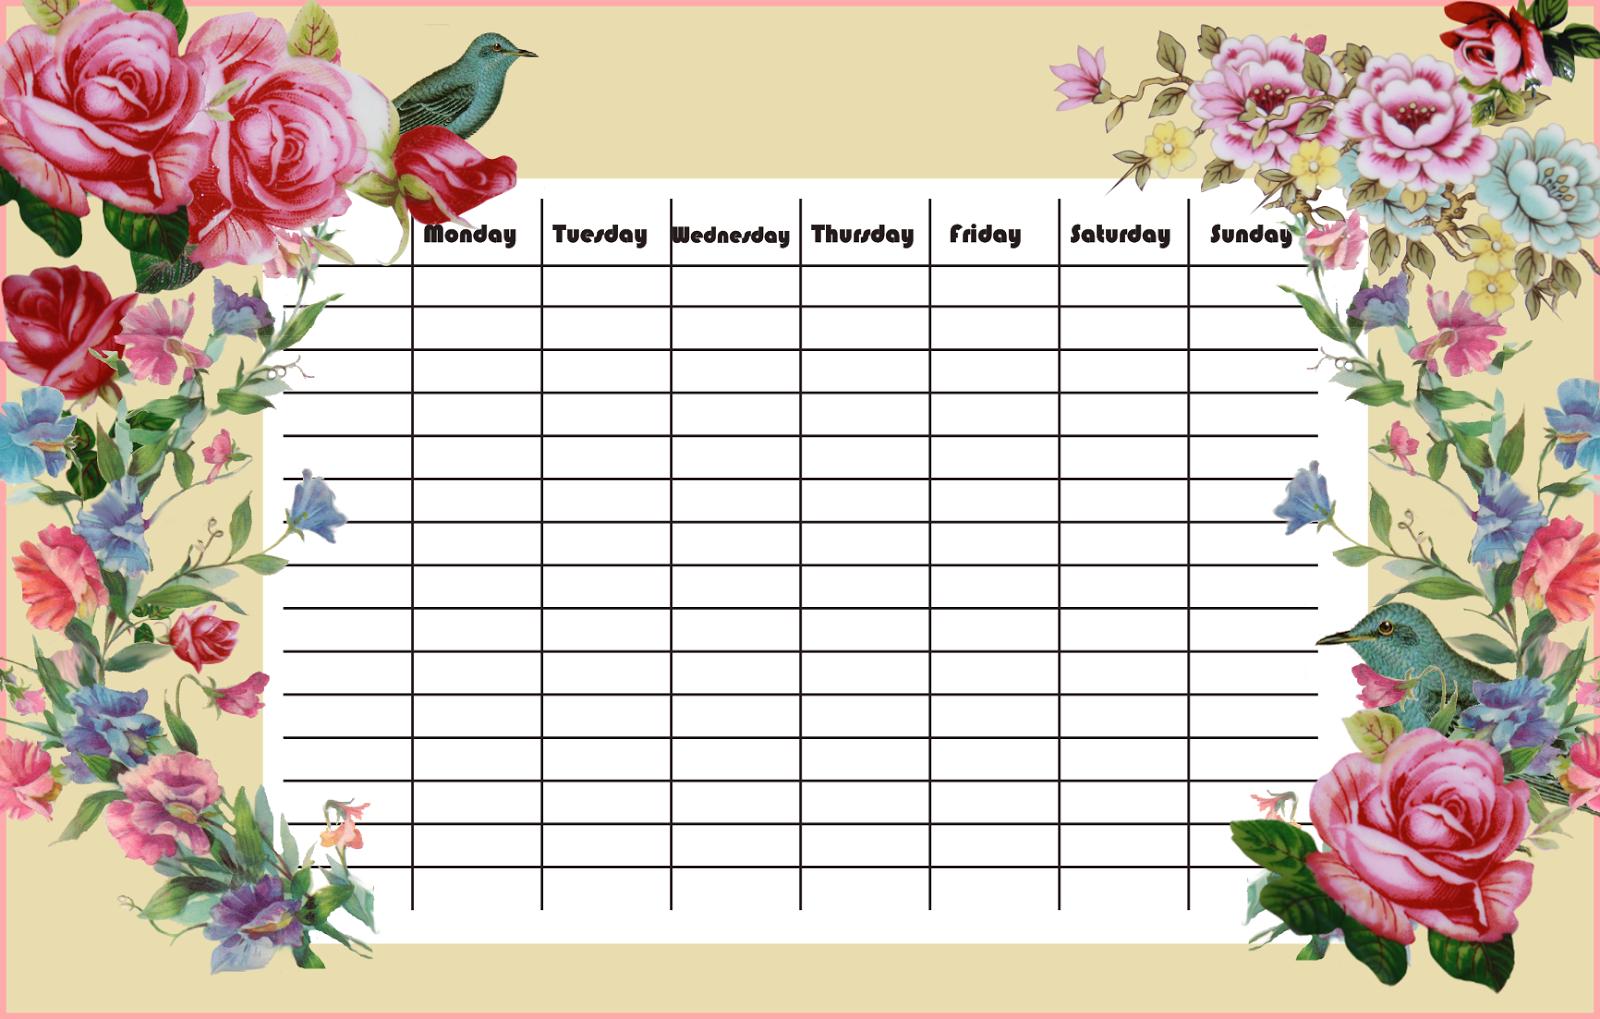 free printable joyous schedule in vintage style - ausdruckbarer ...